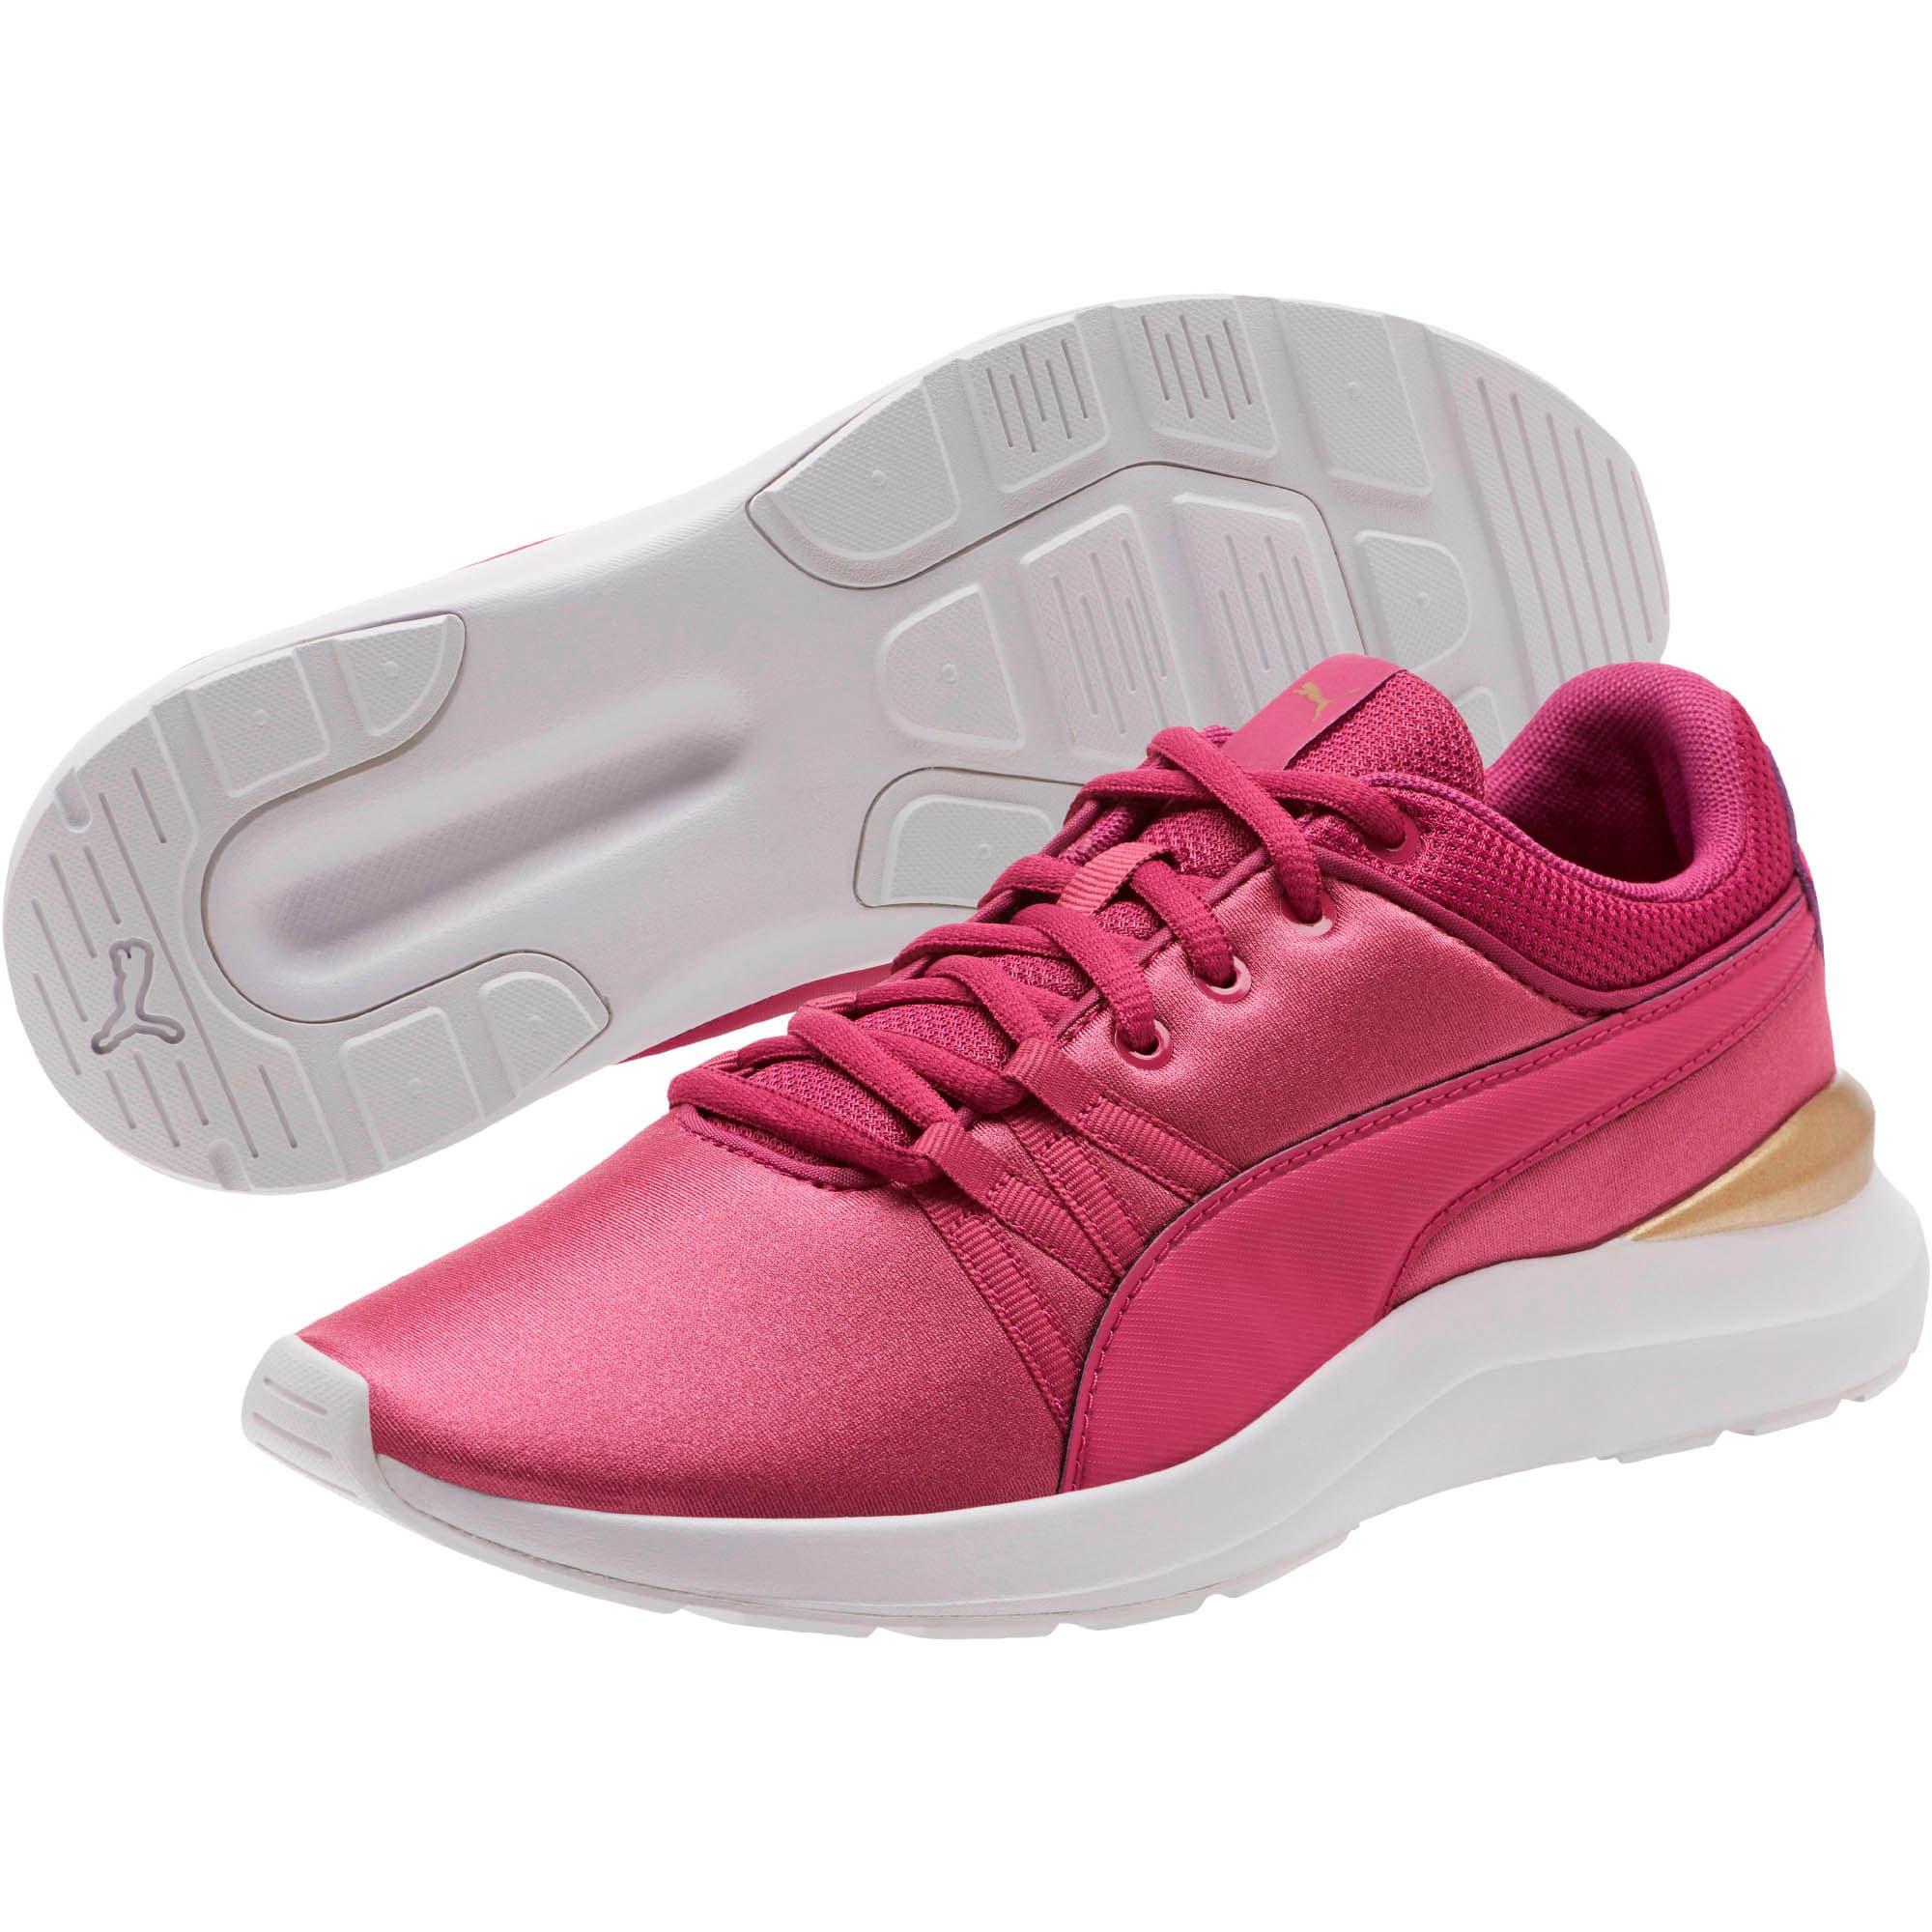 Thumbnail 2 of Adela Women's Sneakers, Magenta Haze-Magenta Haze, medium